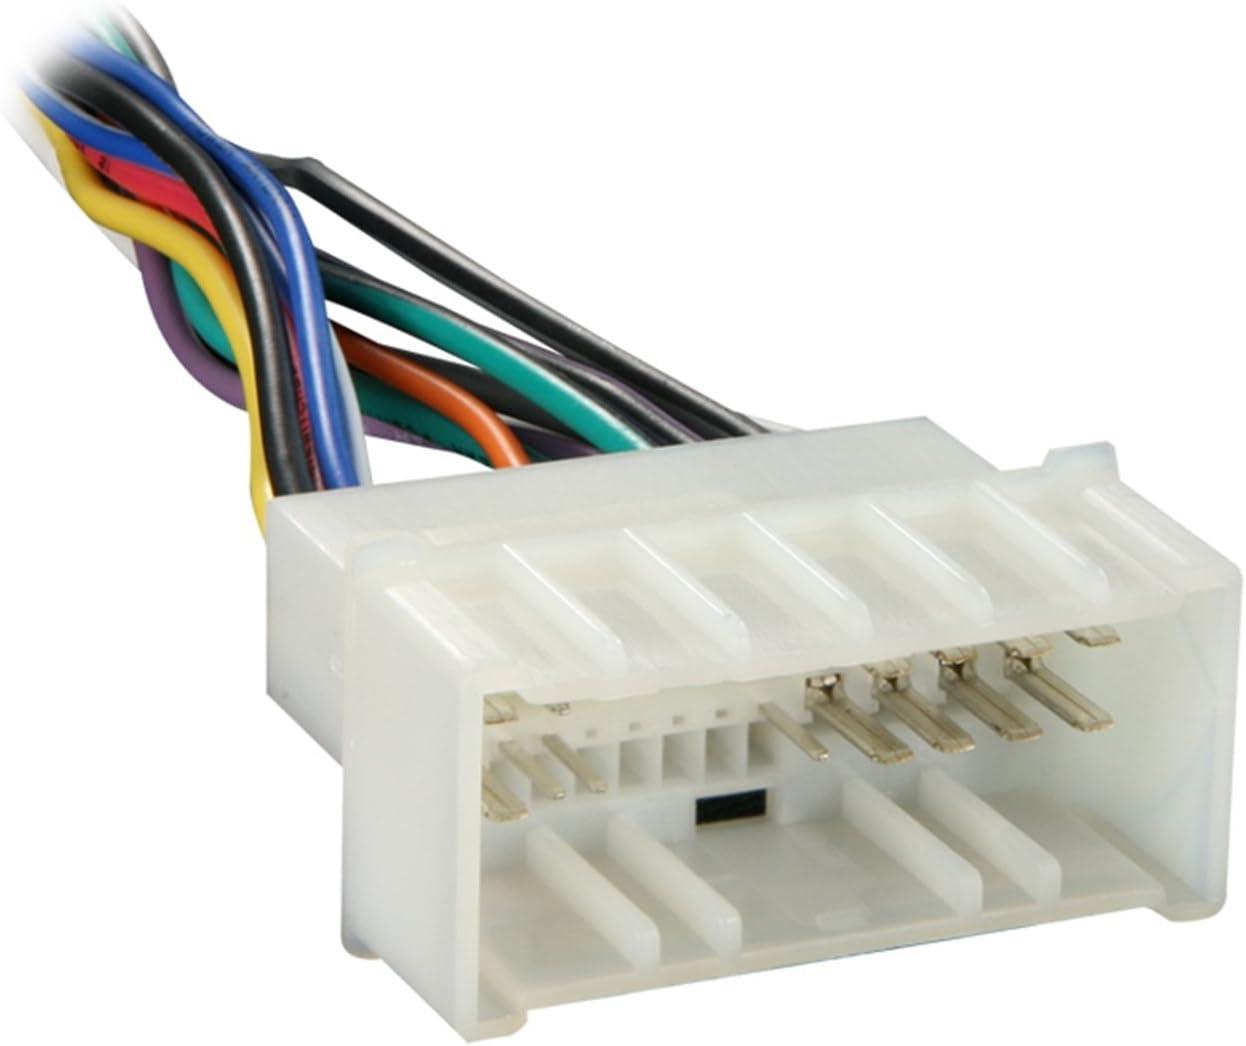 amazon.com: metra 70-1004 radio wiring harness for 04-up kia/06-up hyndai:  car electronics  amazon.com